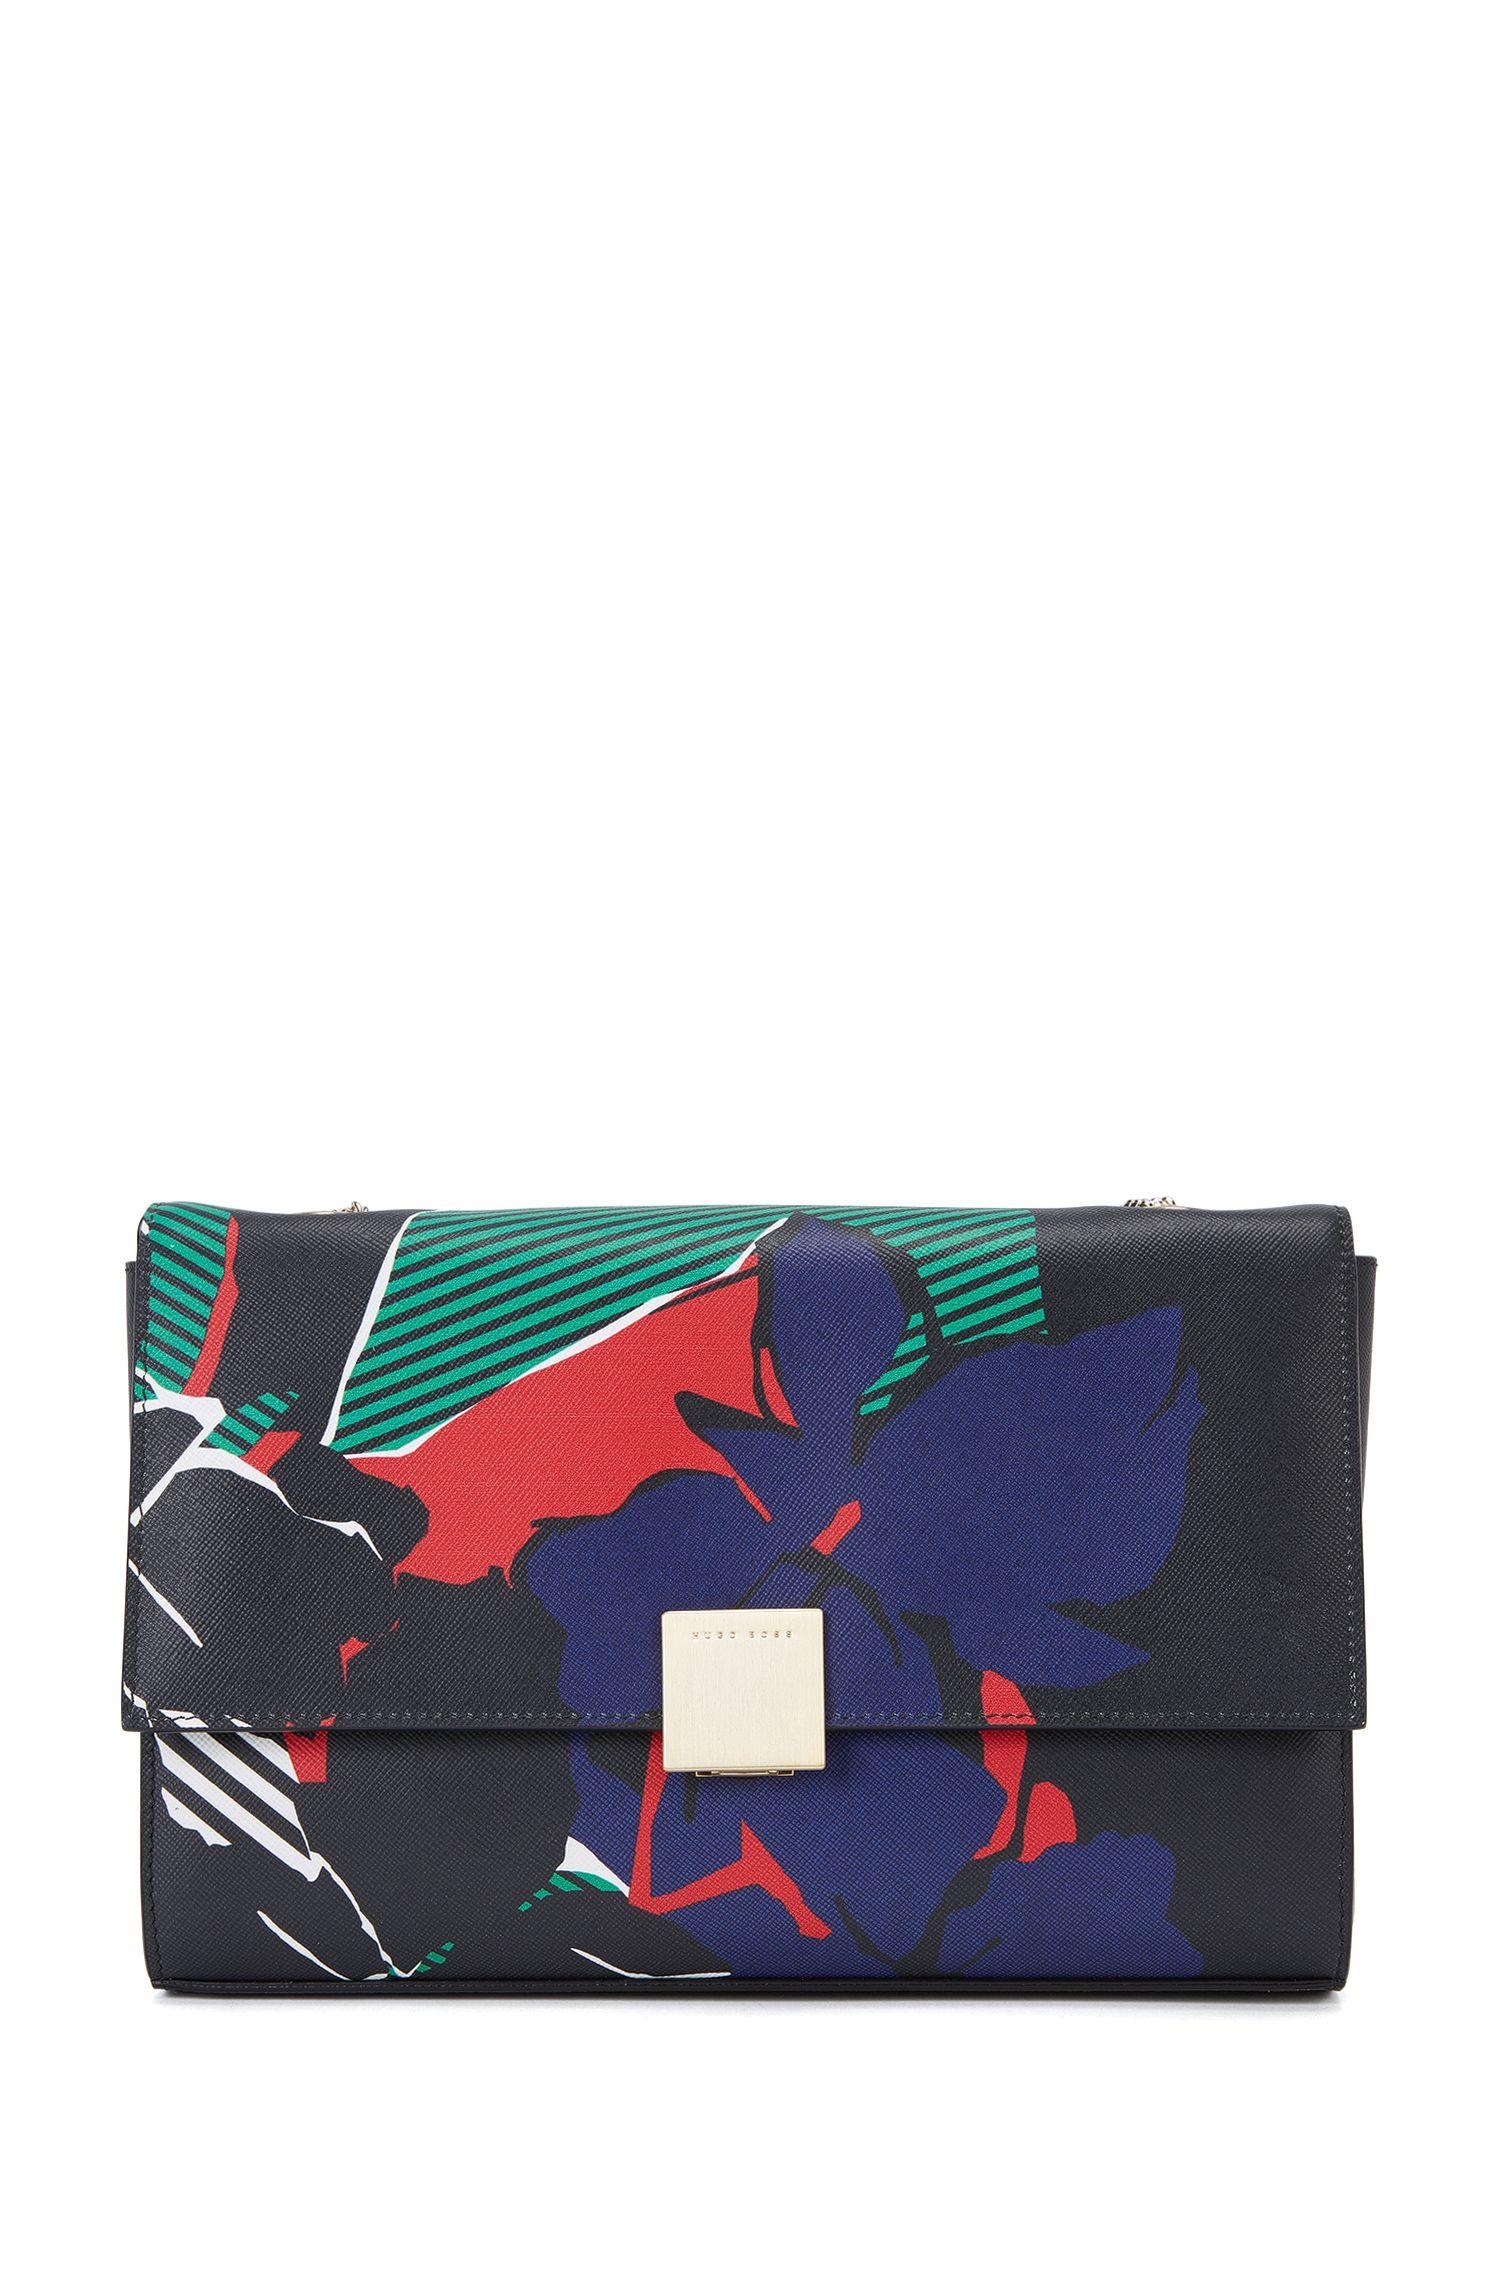 'Munich Flap FL'   Italian Calfskin Printed Handbag, Chain Strap